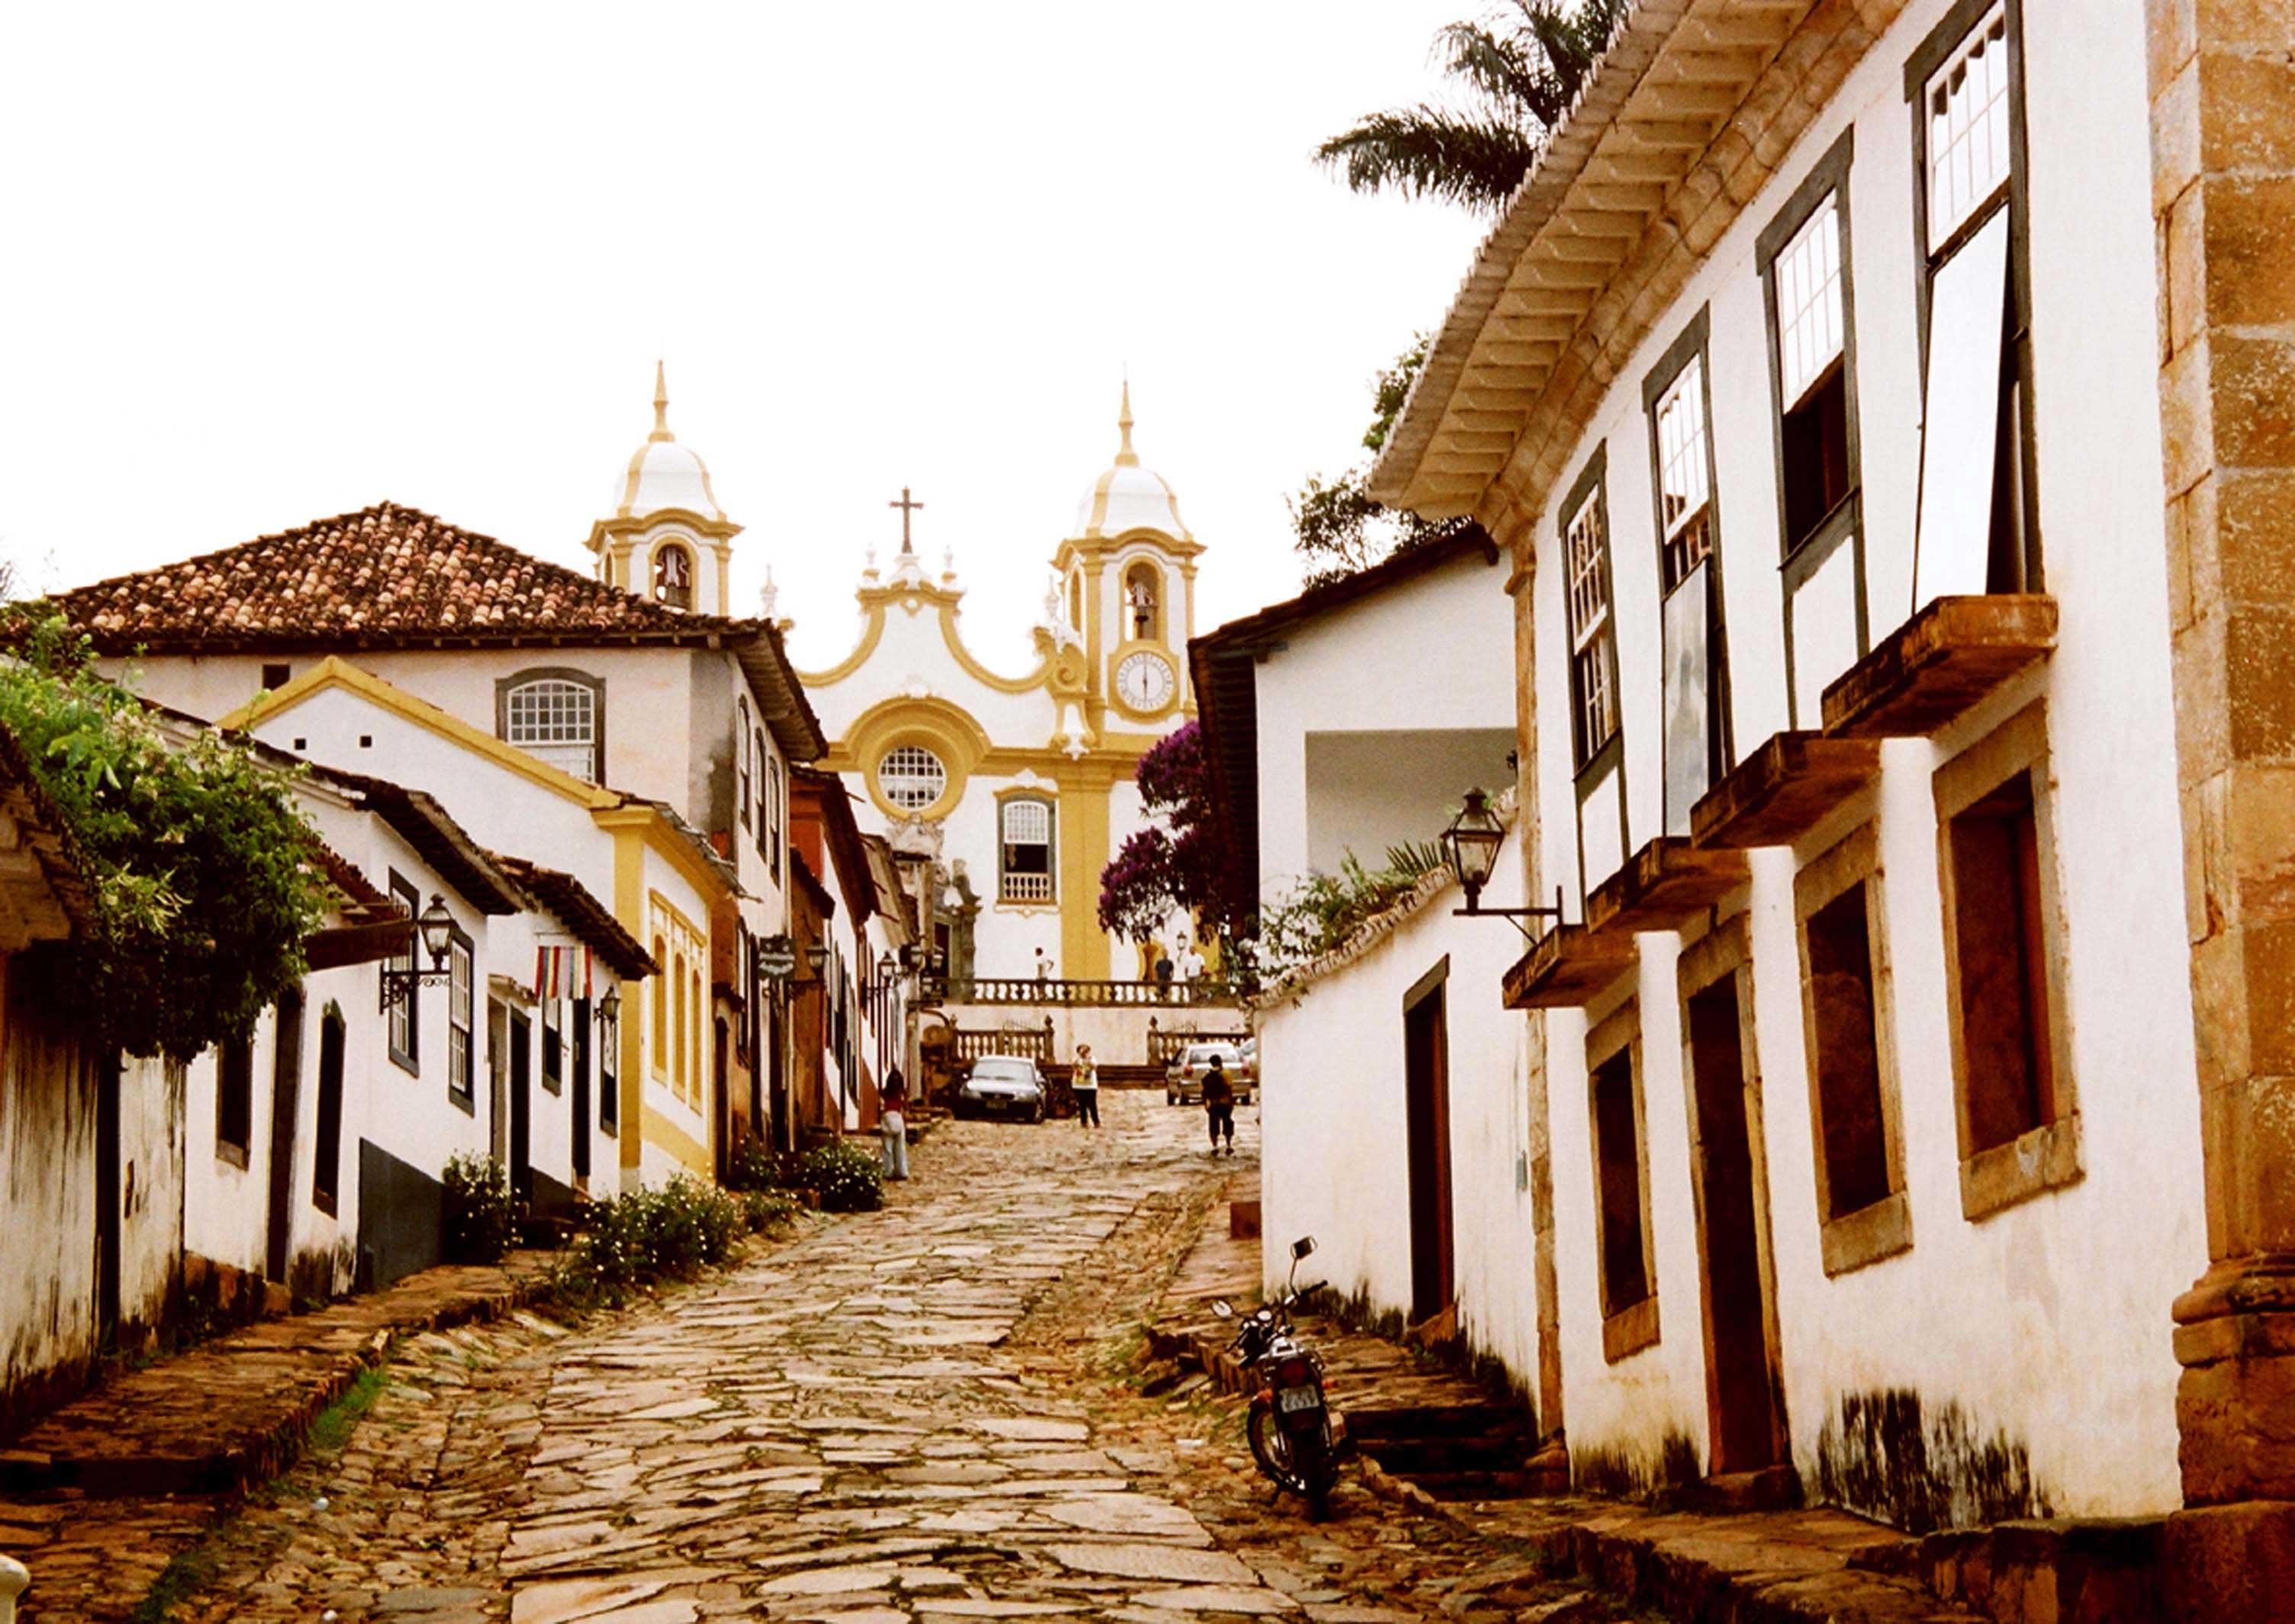 Crédito foto: http://www.alugueldevansbhmg.com.br/cidades-historicas-mg/aluguel-de-van-para-tiradentes-mg/